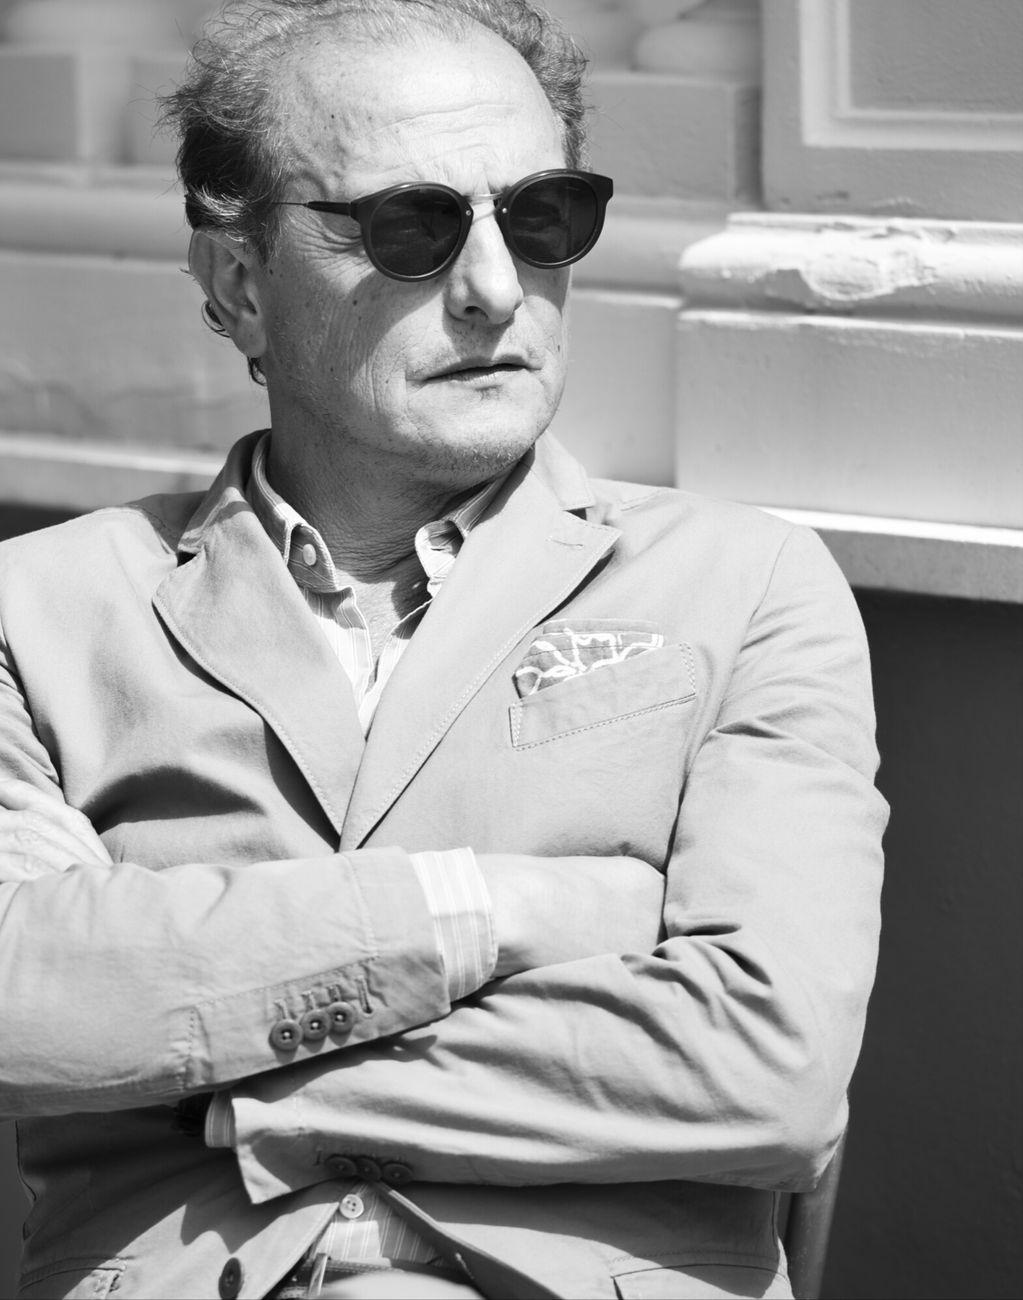 Angelo Mosca. Photo credit Annalaura Pretaroli